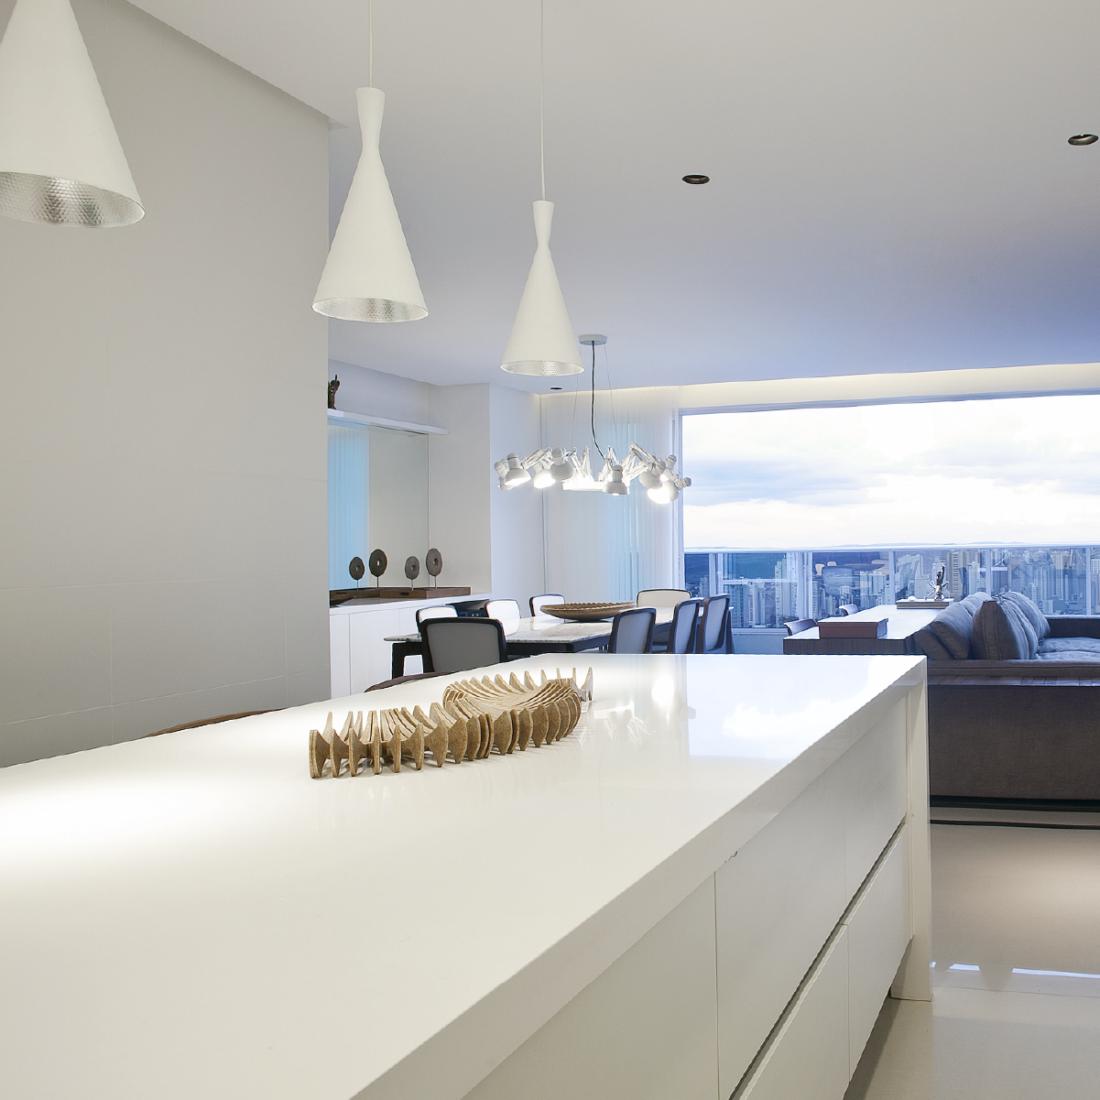 Image of Mesa de trabajo 7@2x in Cuisines - Cosentino